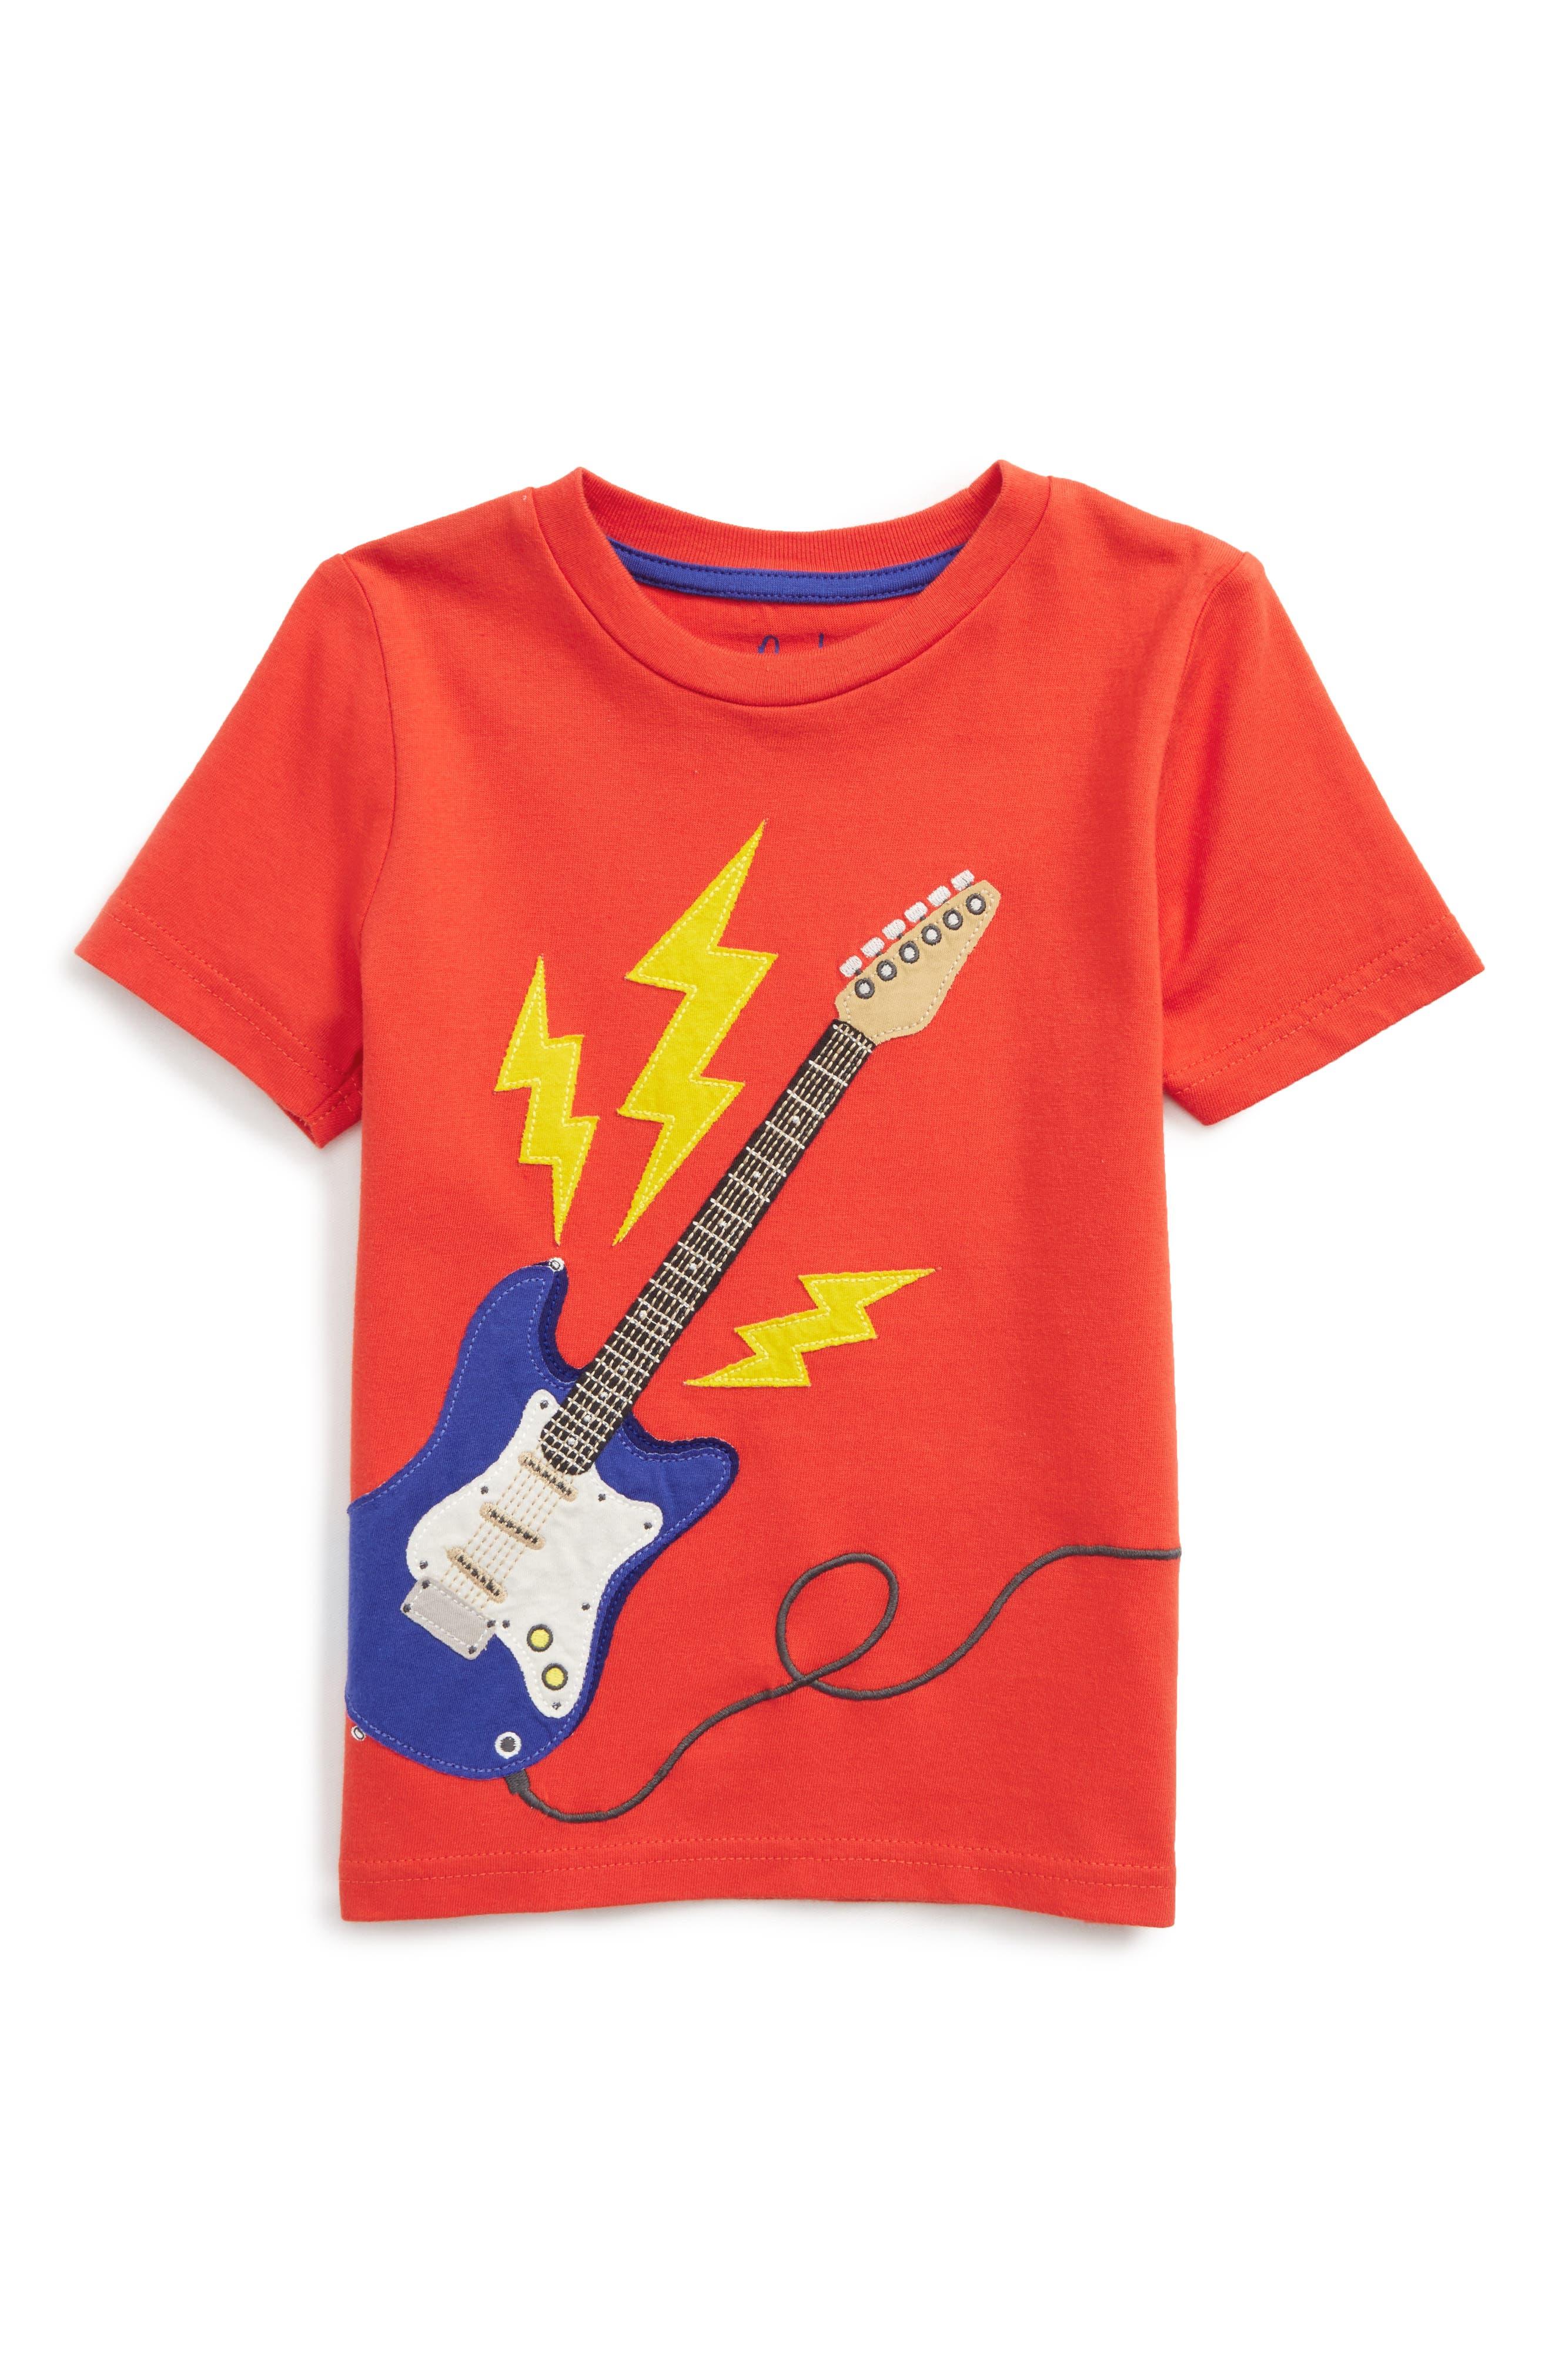 Alternate Image 1 Selected - Mini Boden Music Appliqué T-Shirt (Toddler Boys, Little Boys & Big Boys)